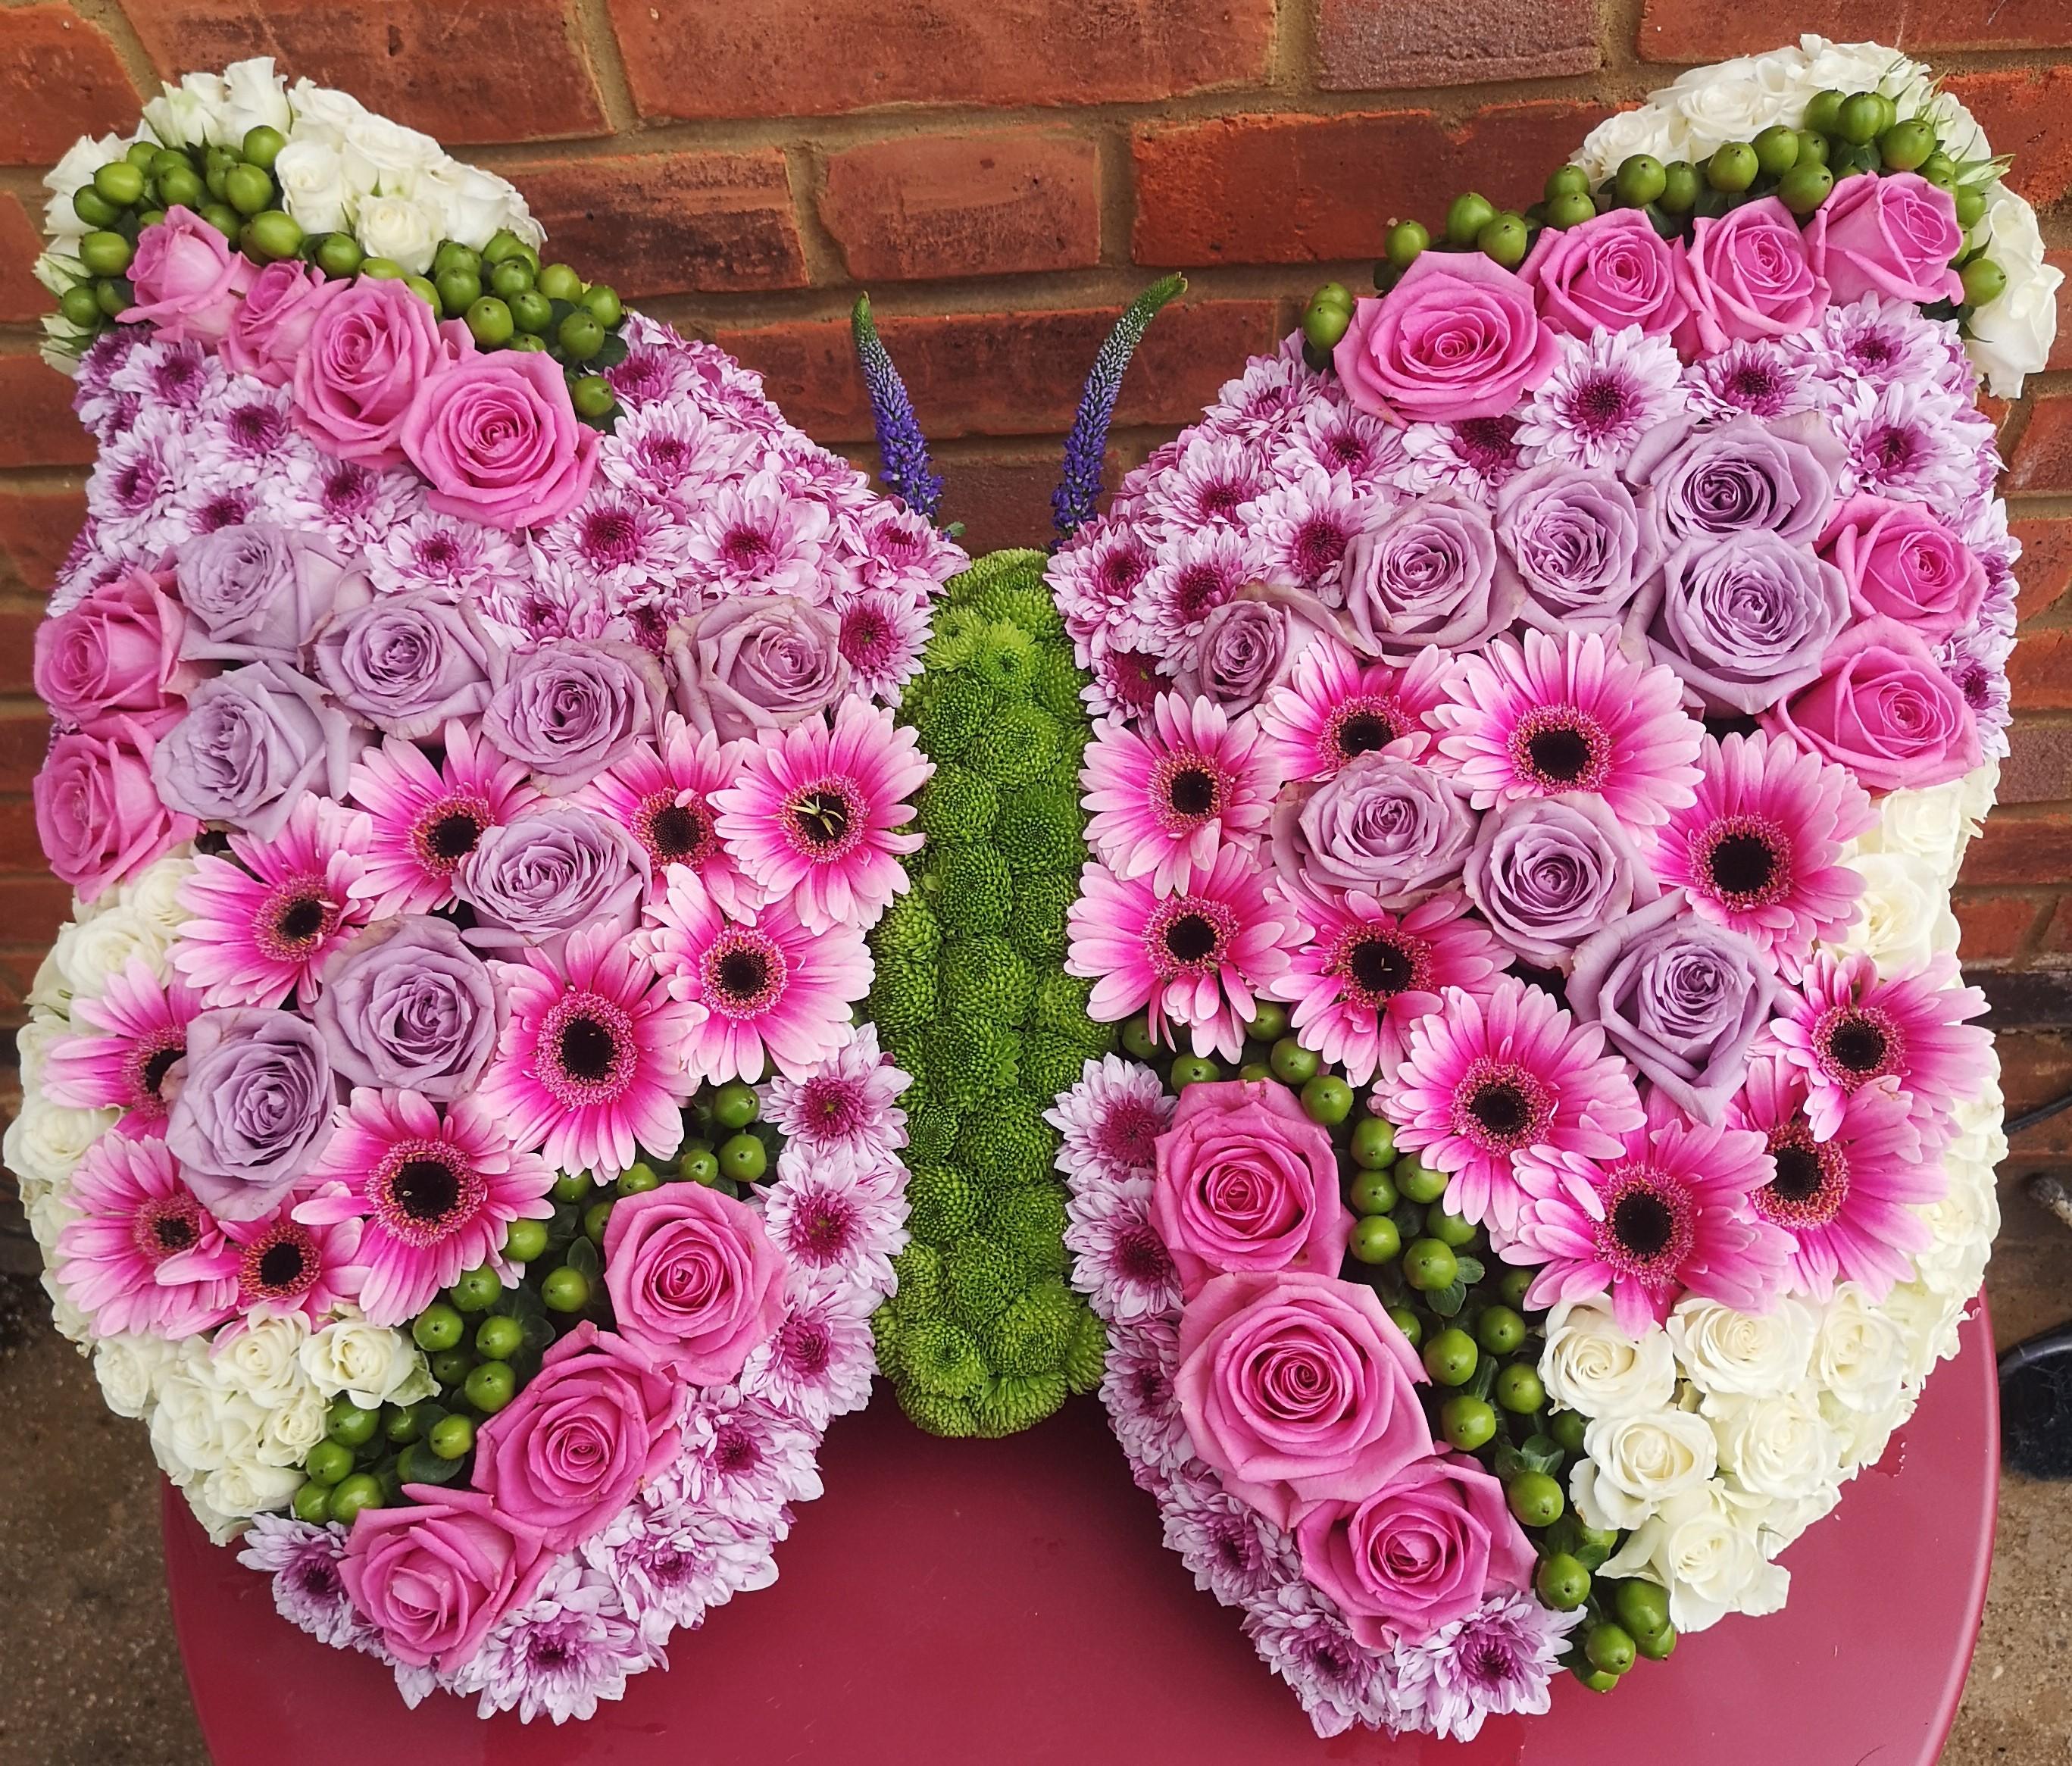 Funeral Flowers Butterfly £145